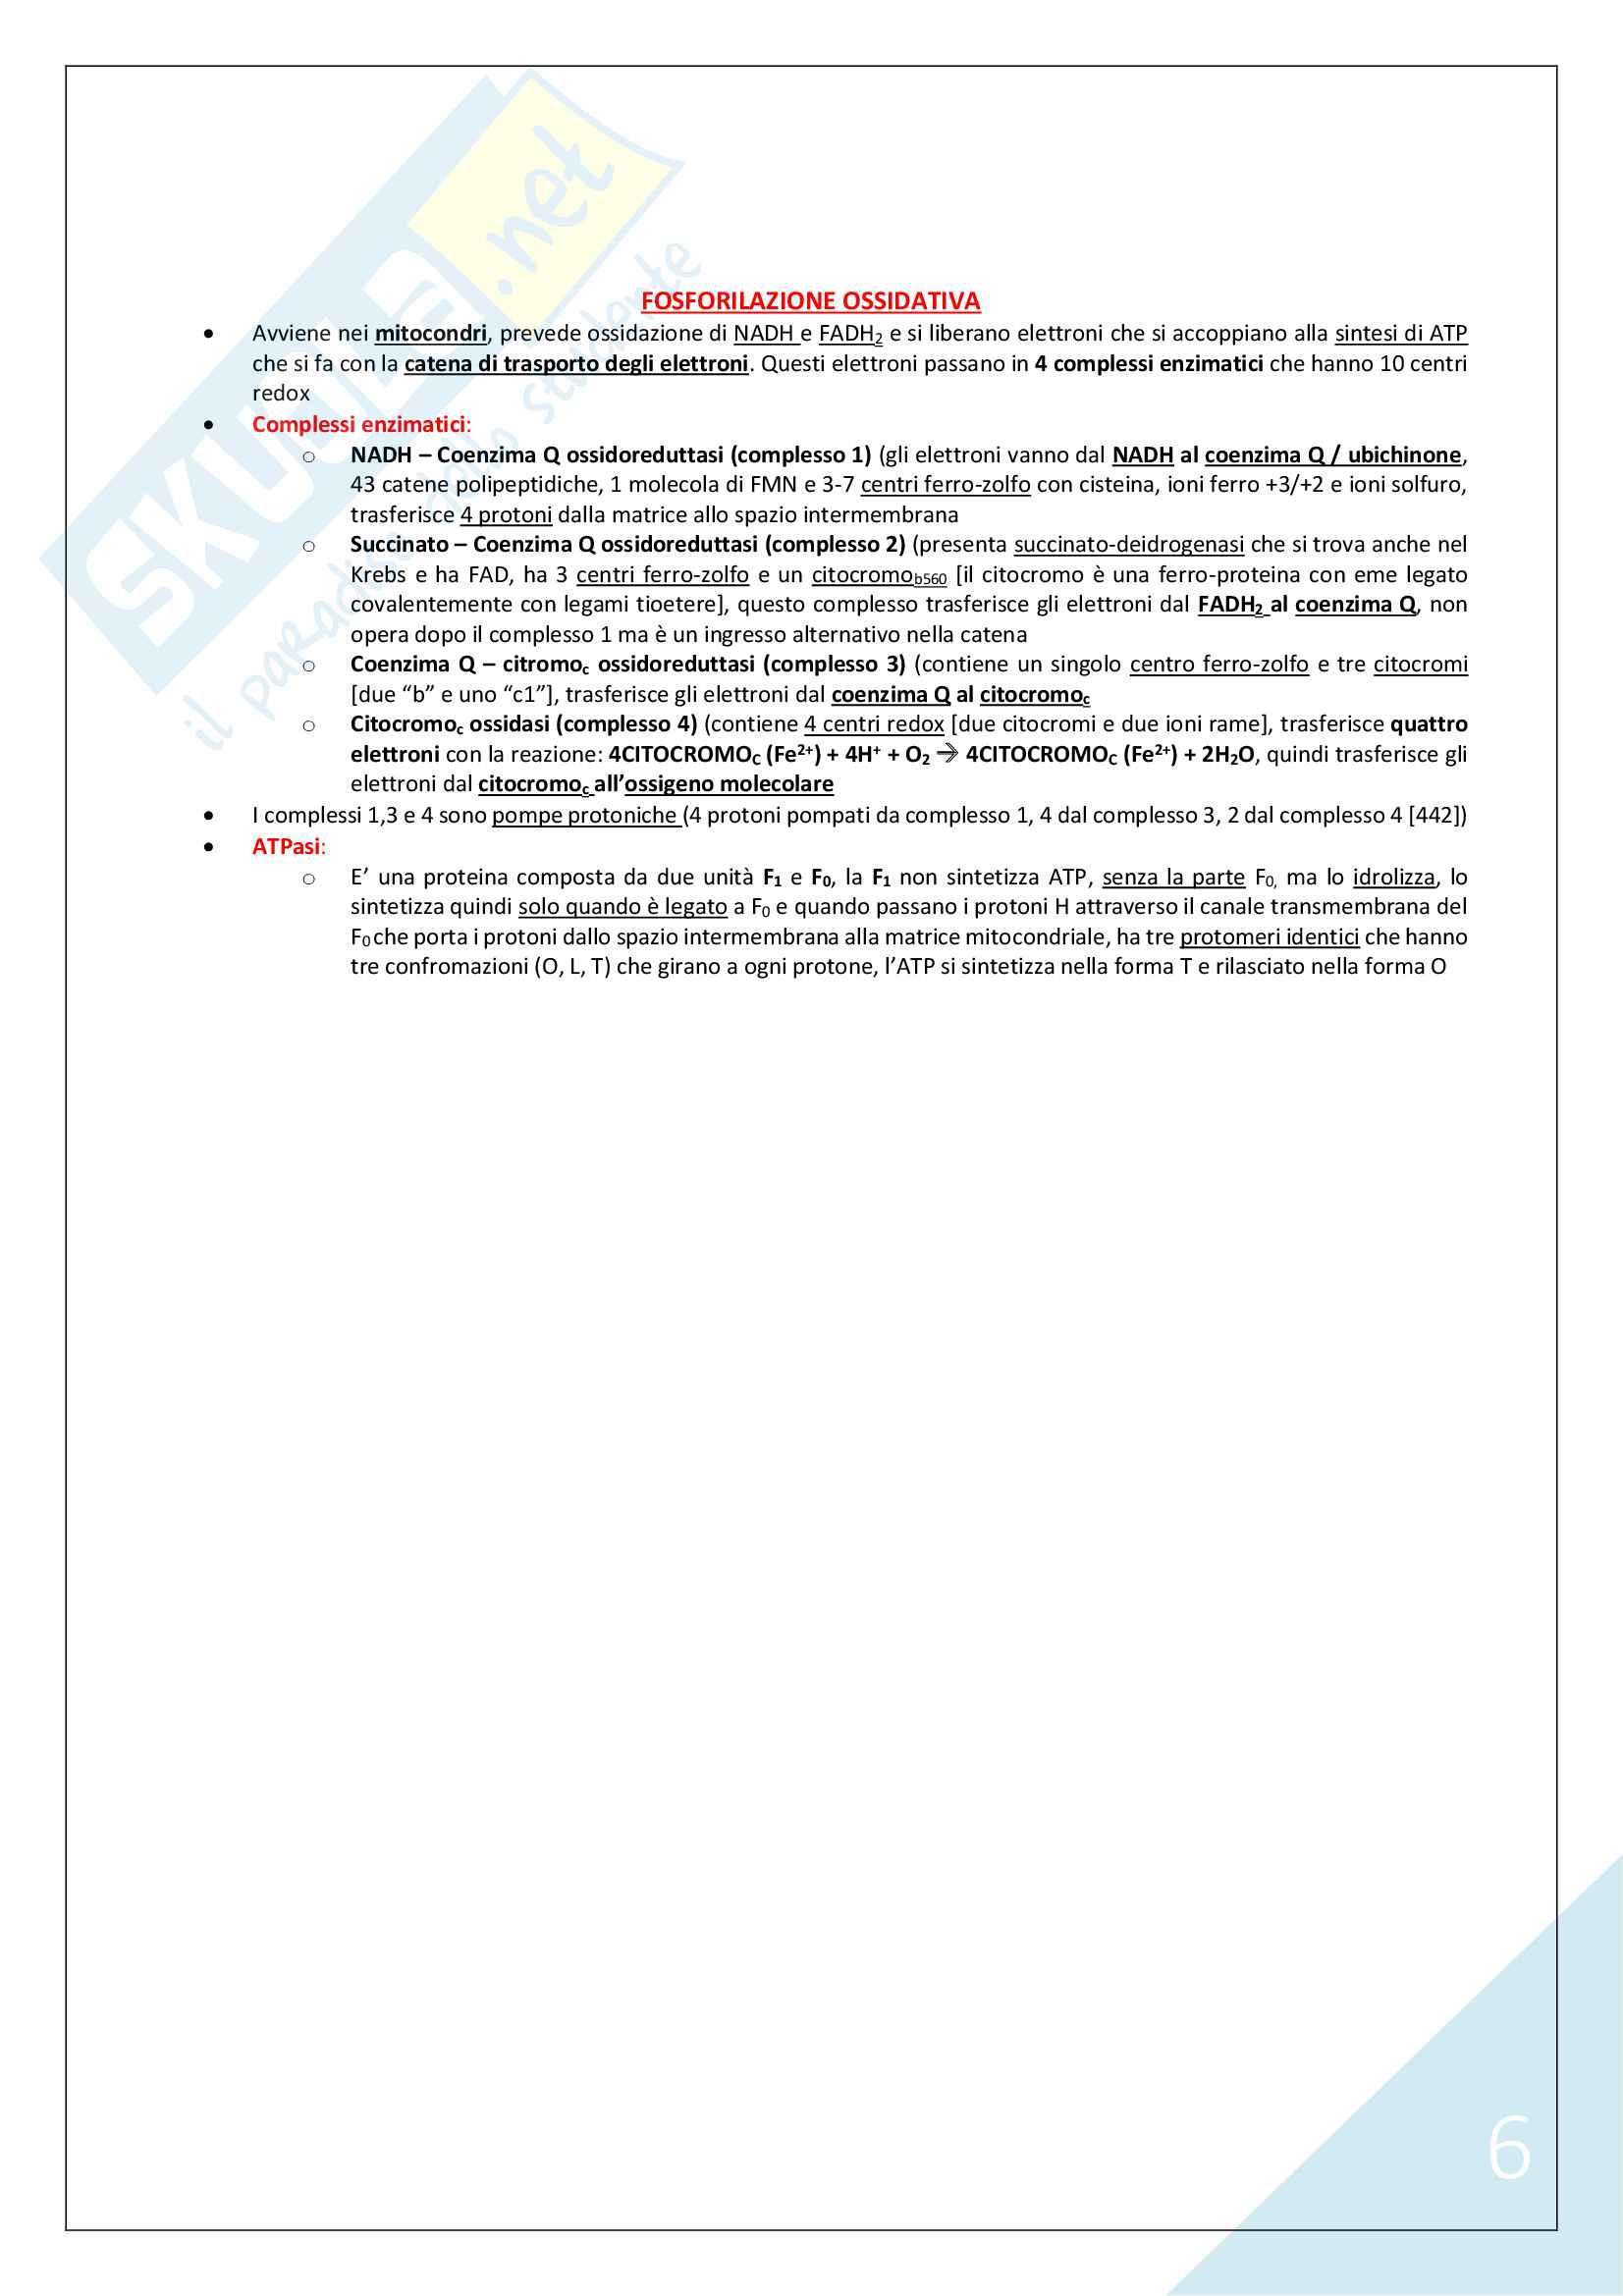 Biochimica Umana - 1° Anno Scienze Motorie (Reazioni ed Enzimi) Pag. 6